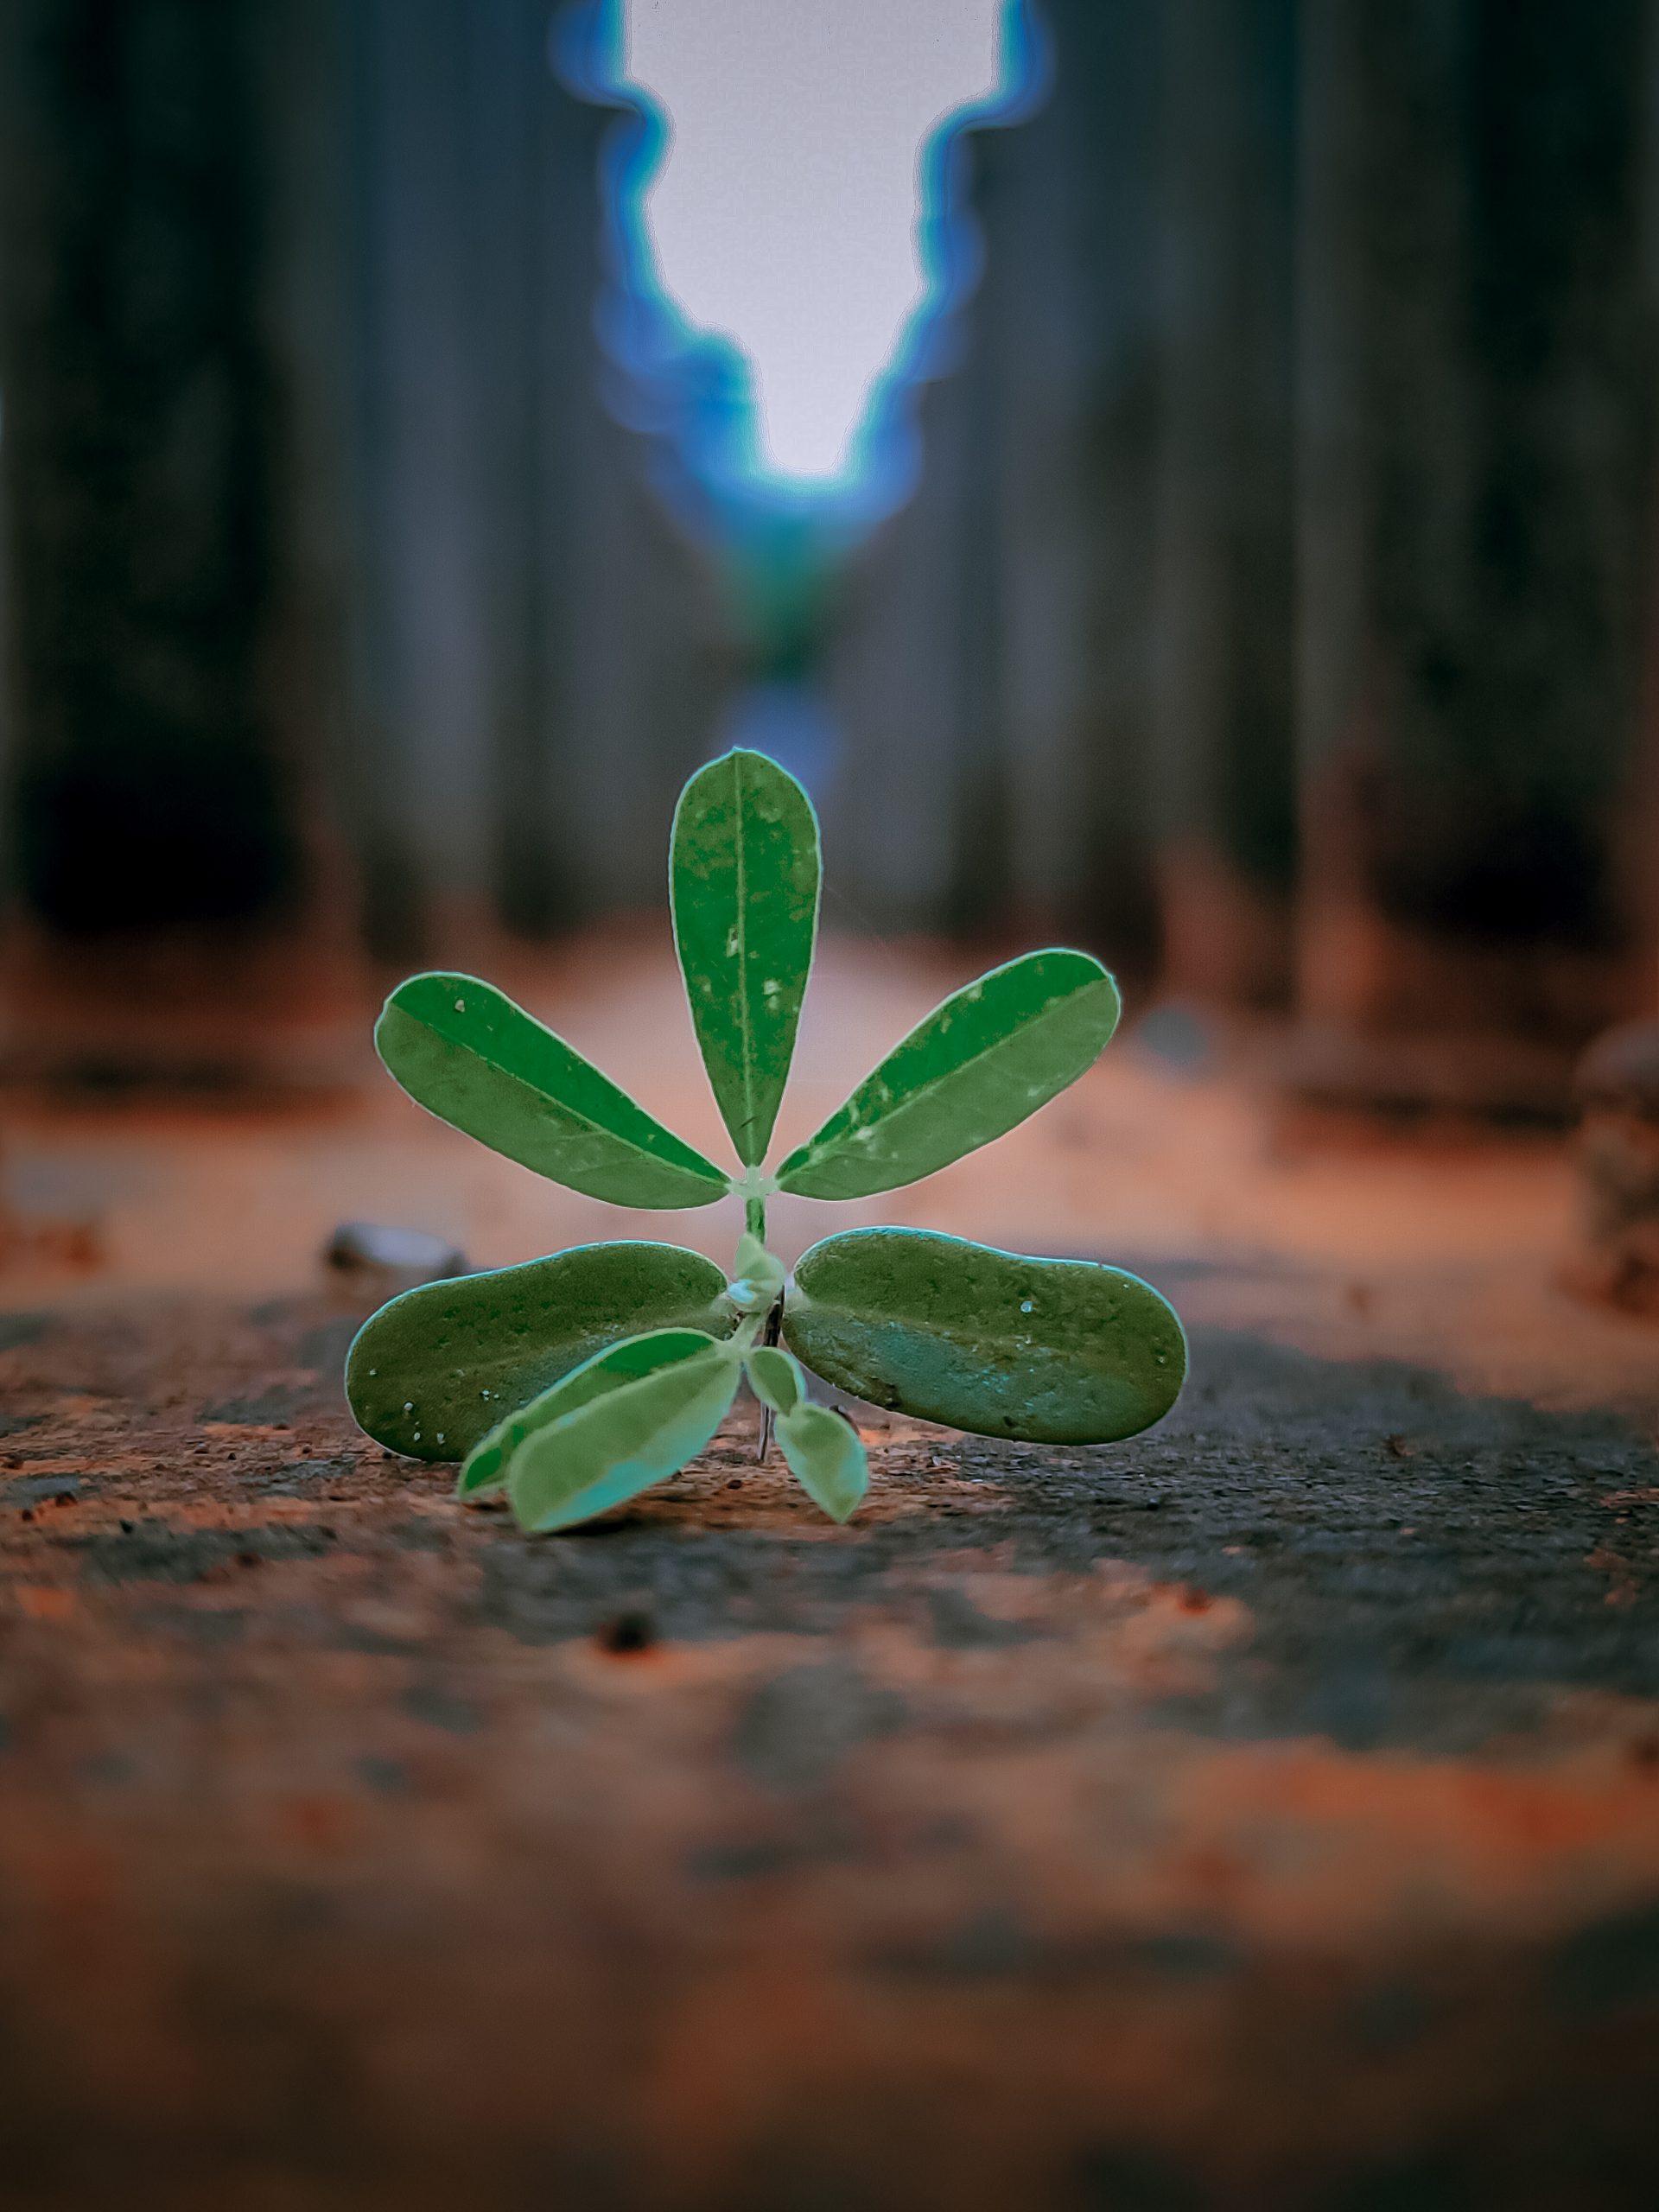 A broken small plant